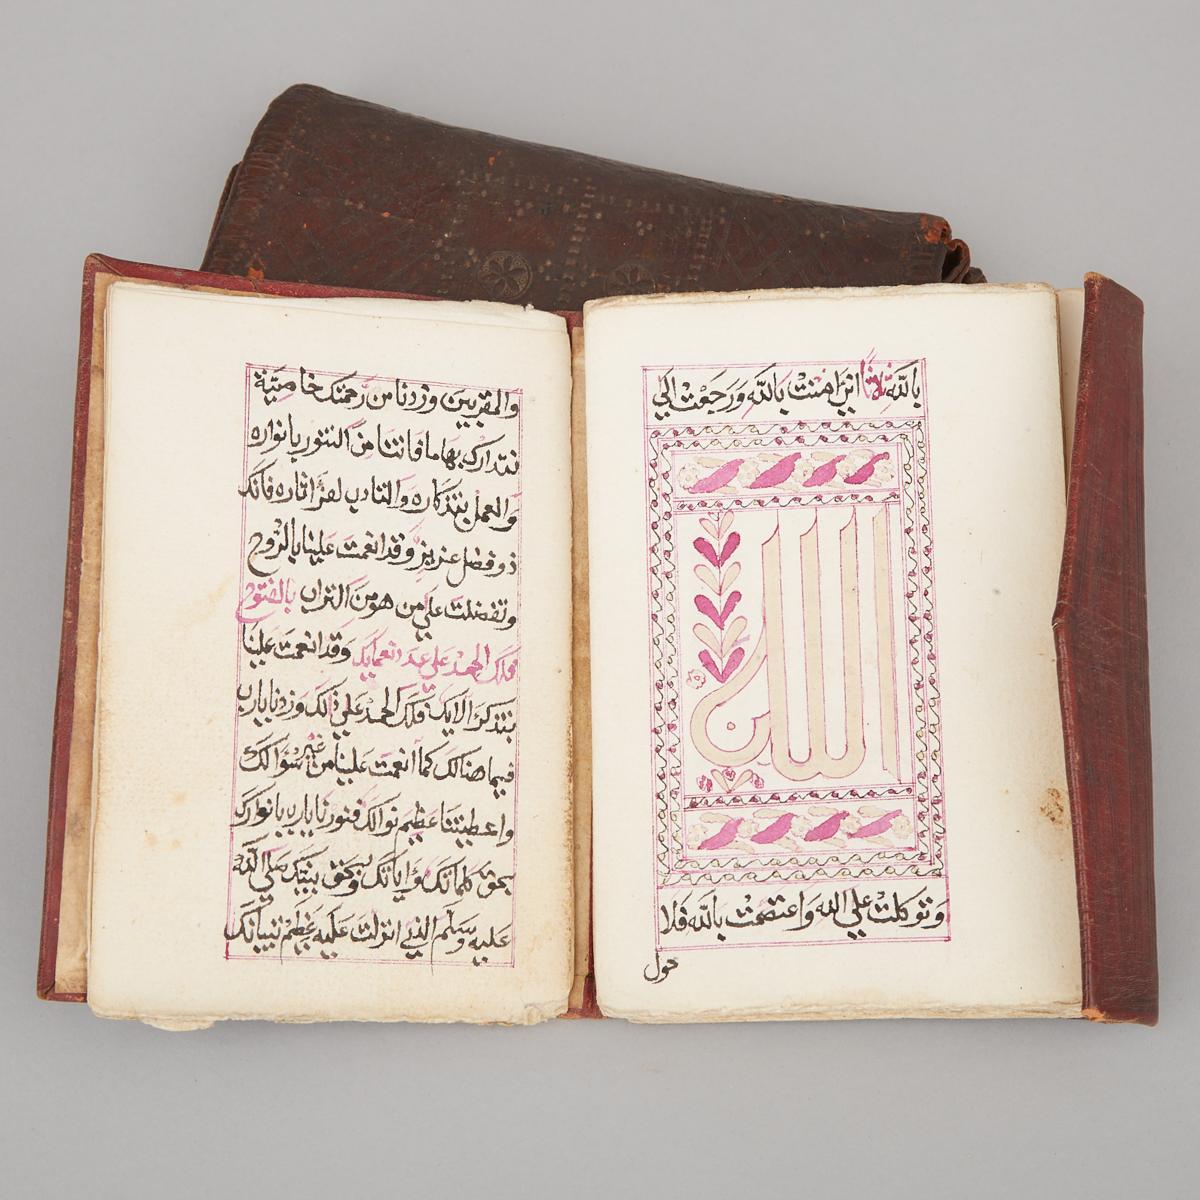 Islamic Prayer Manuscript, 19th century, 7 x 5.5 in — 17.8 x 14 cm - Image 5 of 6